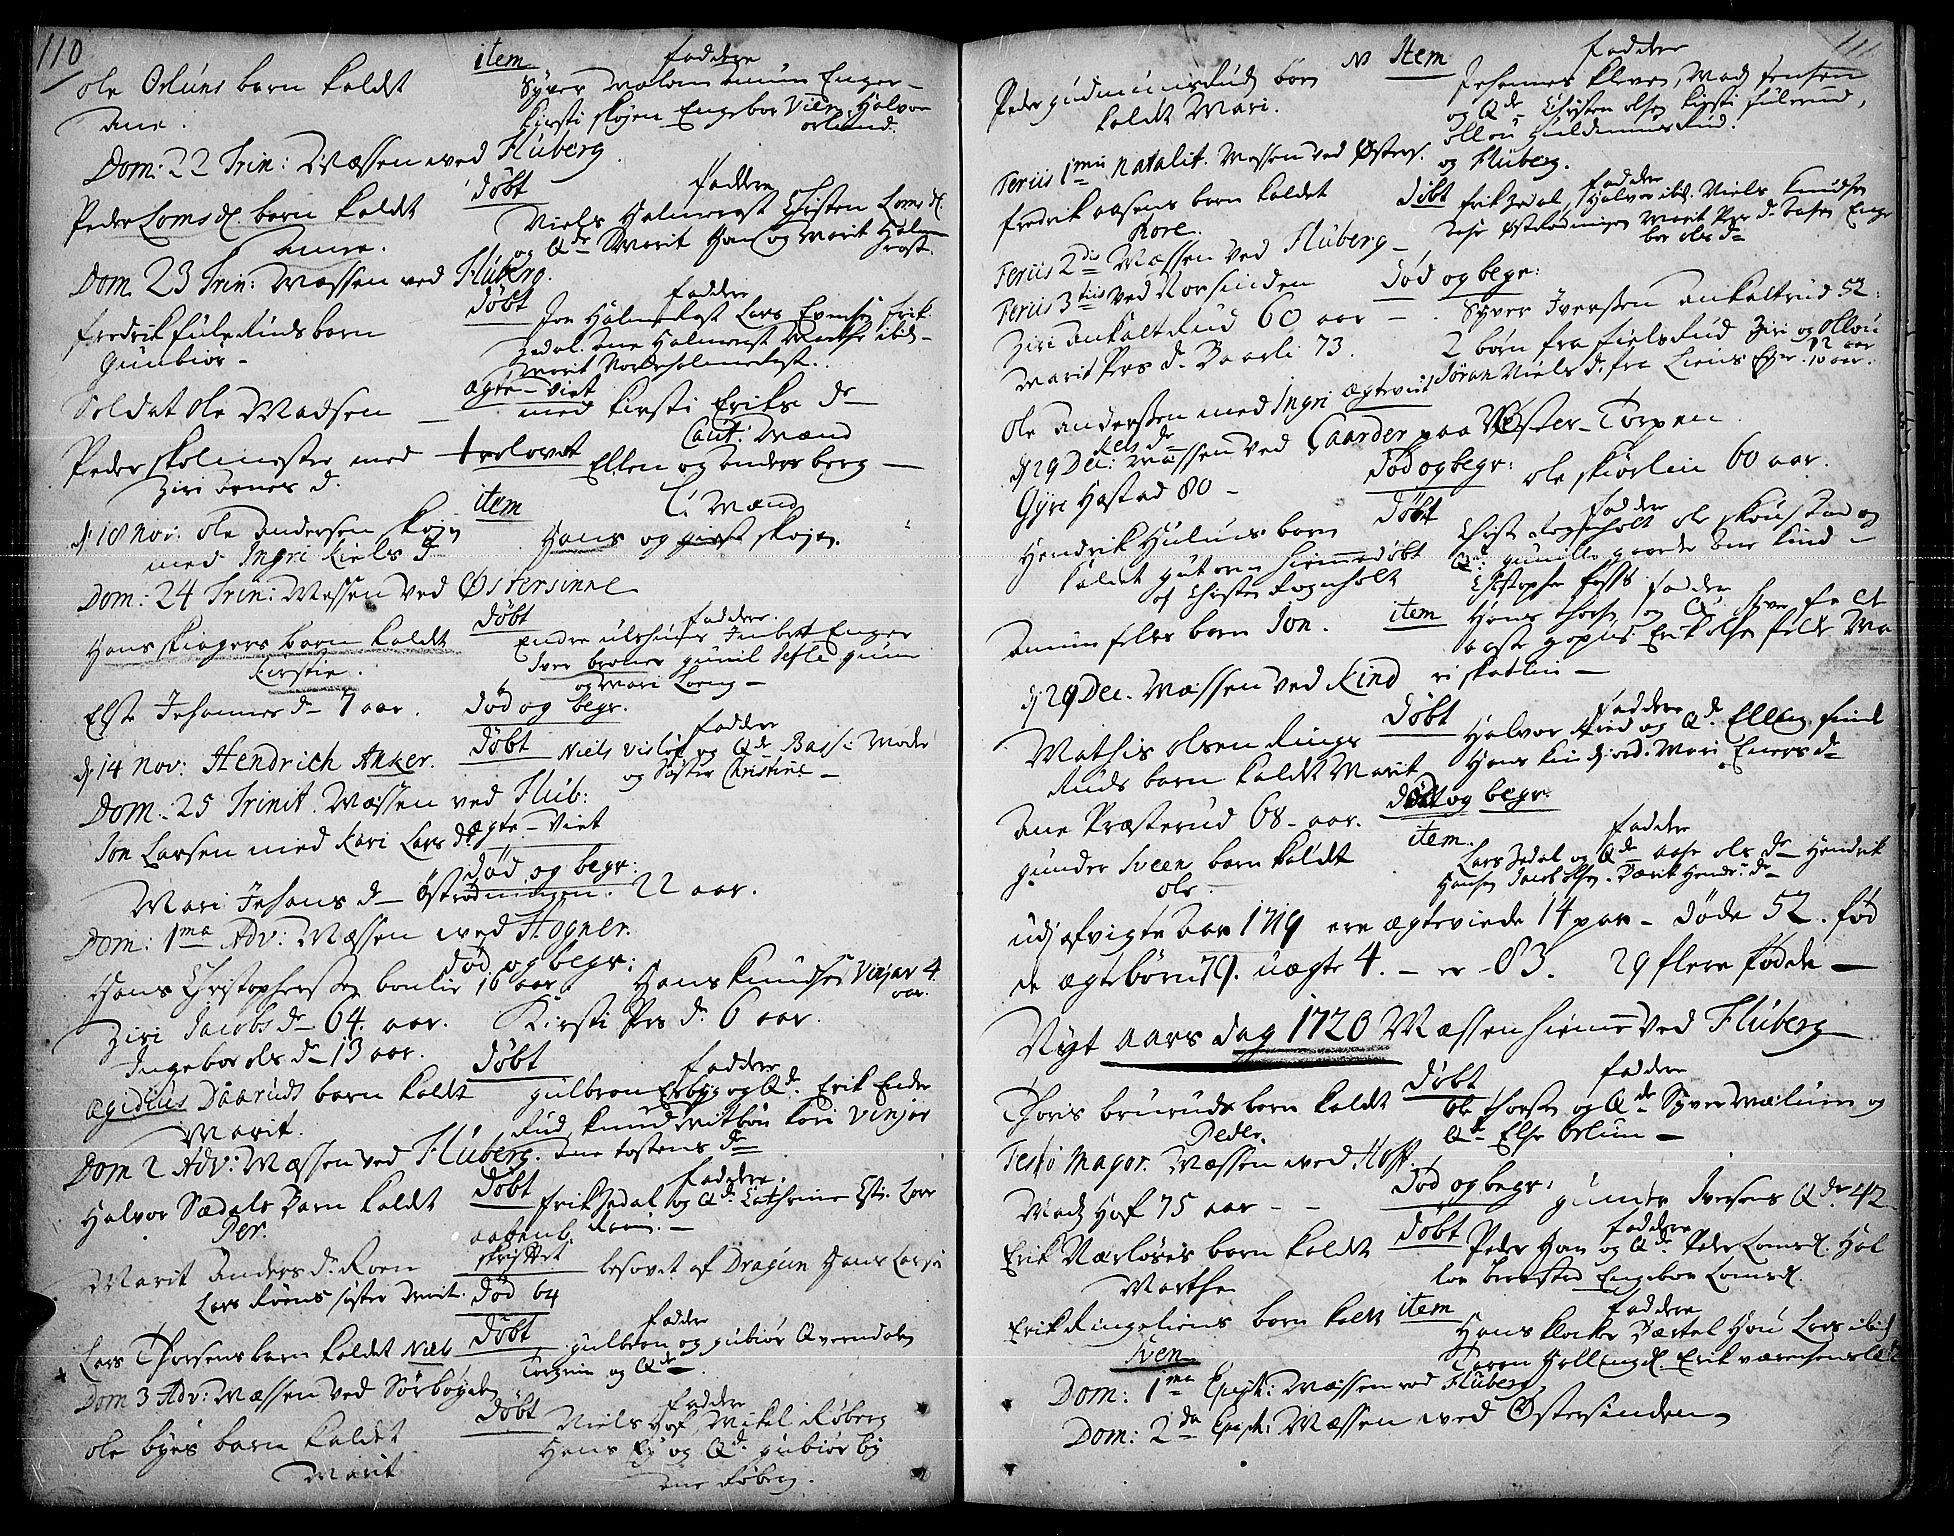 SAH, Land prestekontor, Ministerialbok nr. 1, 1708-1732, s. 110-111